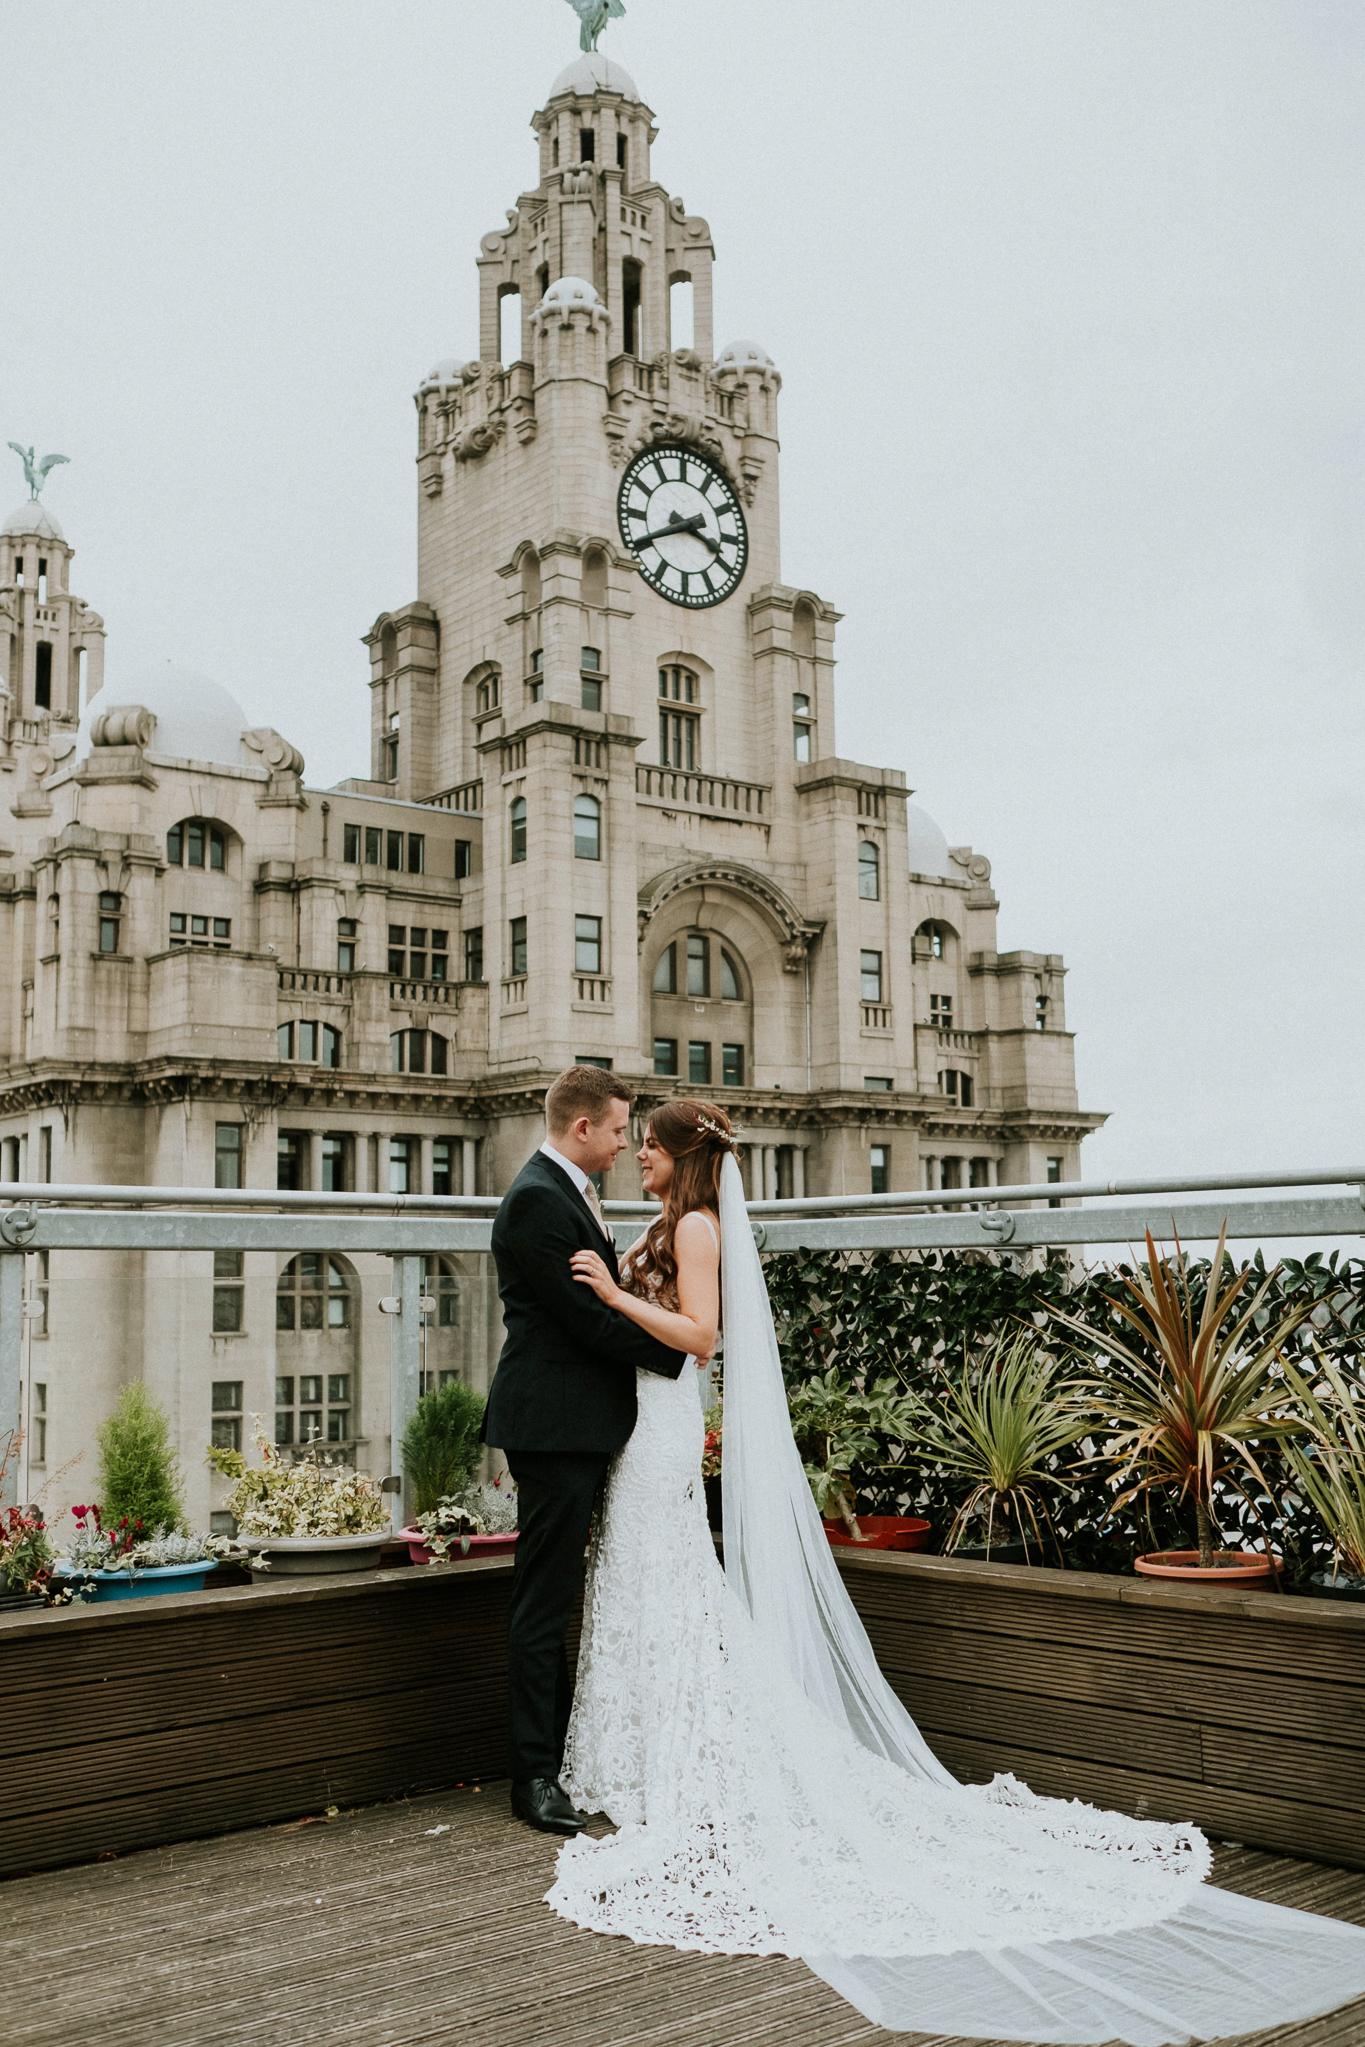 105 Oh Me Oh My Liverpool Cool Fun Creative Wedding Photographer Joanna Nicole Photography1.jpg